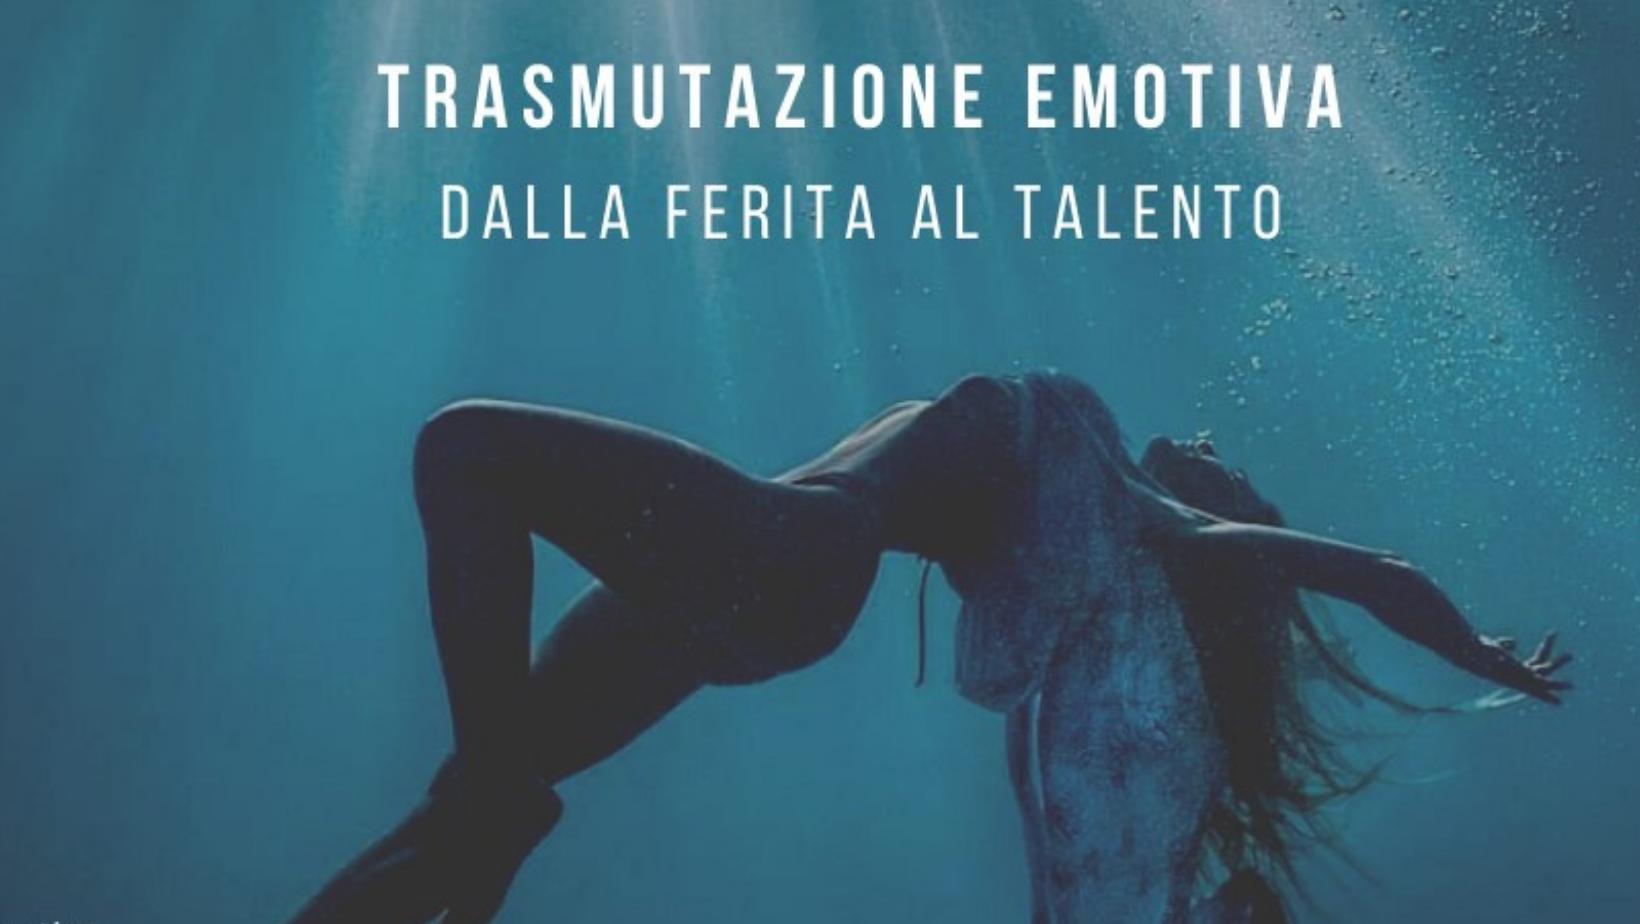 Trasmutazione Emotiva